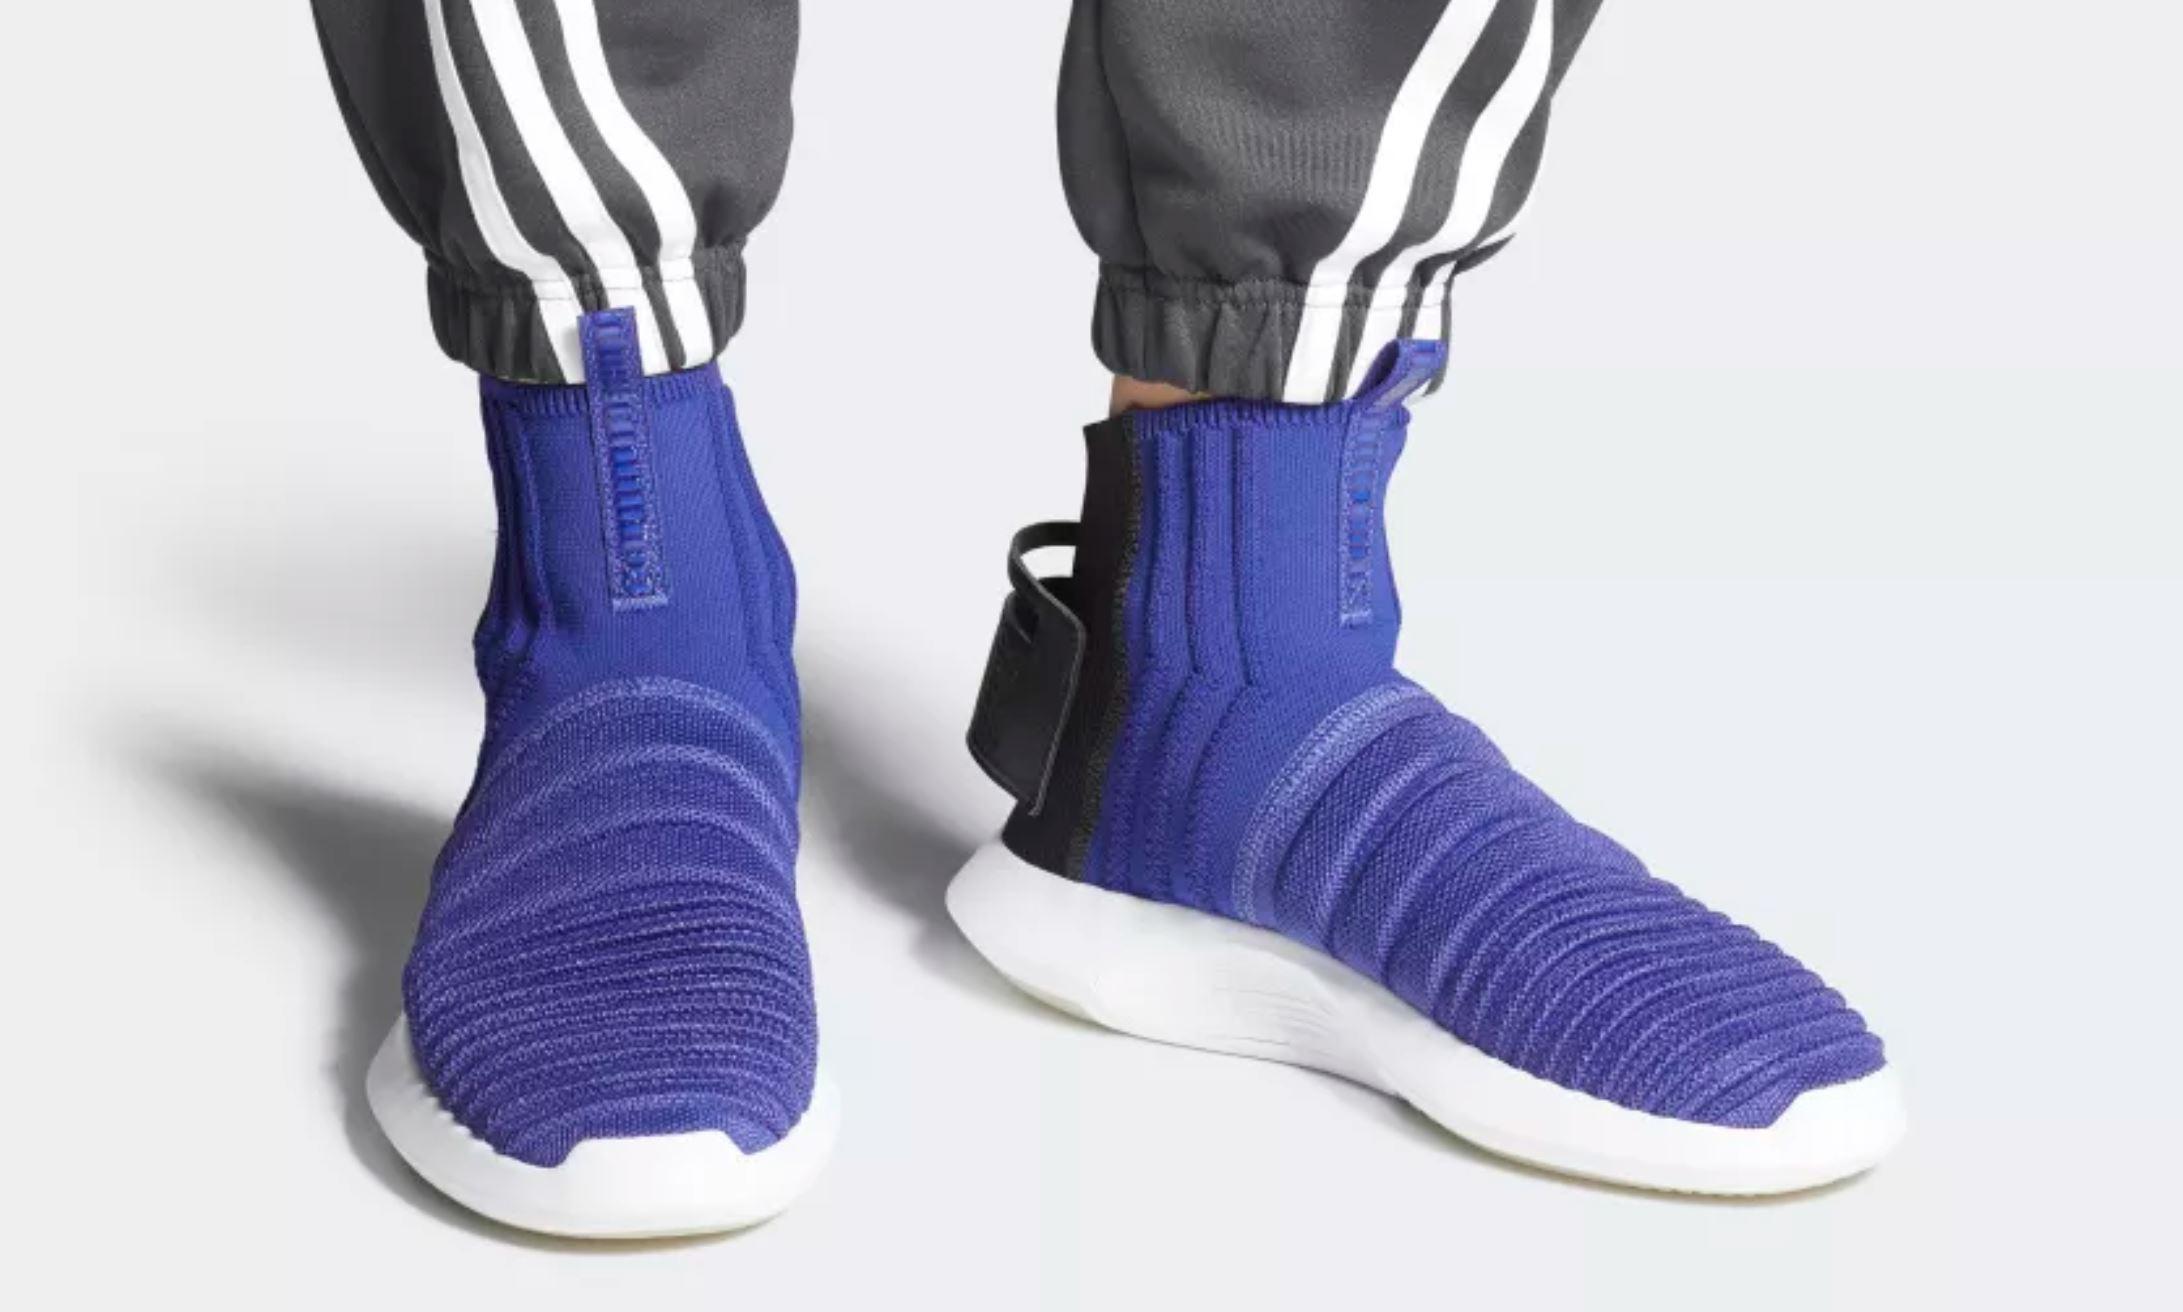 9d995be83e6a adidas crazy 1 adv sock primeknit  adidas crazy 1 adv sock pk real purple